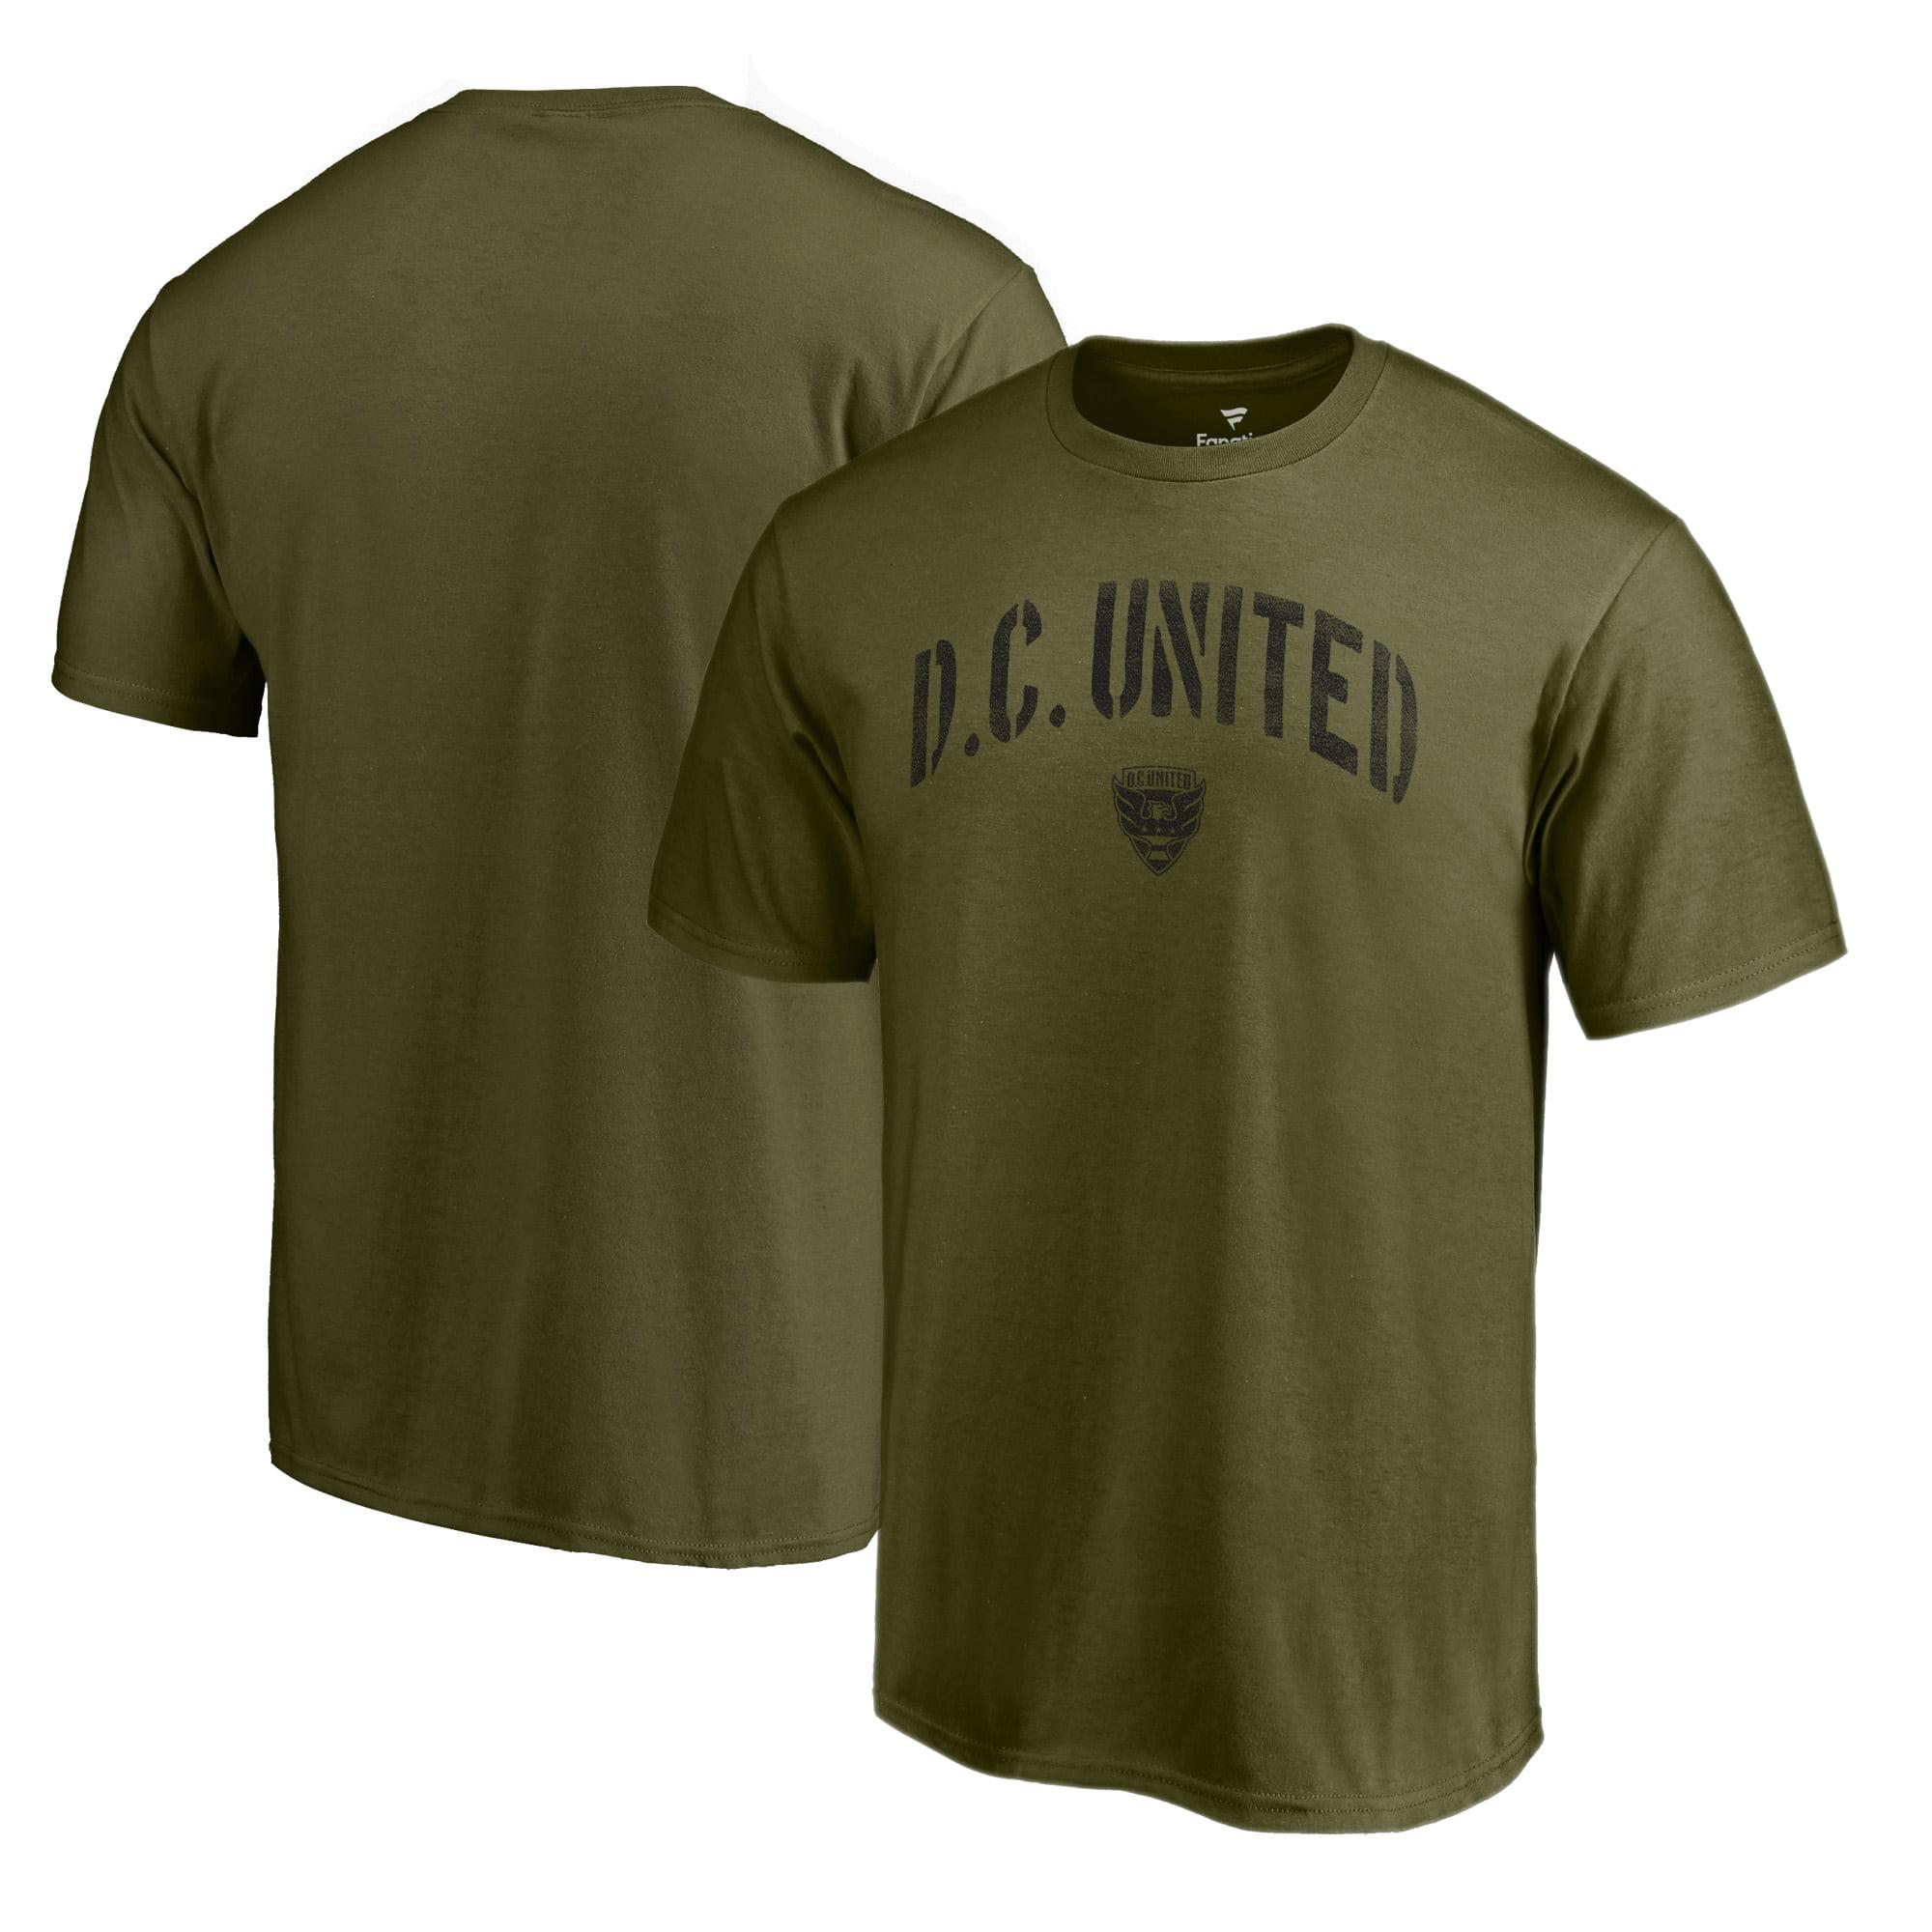 D.C. United Fanatics Branded Camo Collection Jungle T-Shirt - Green